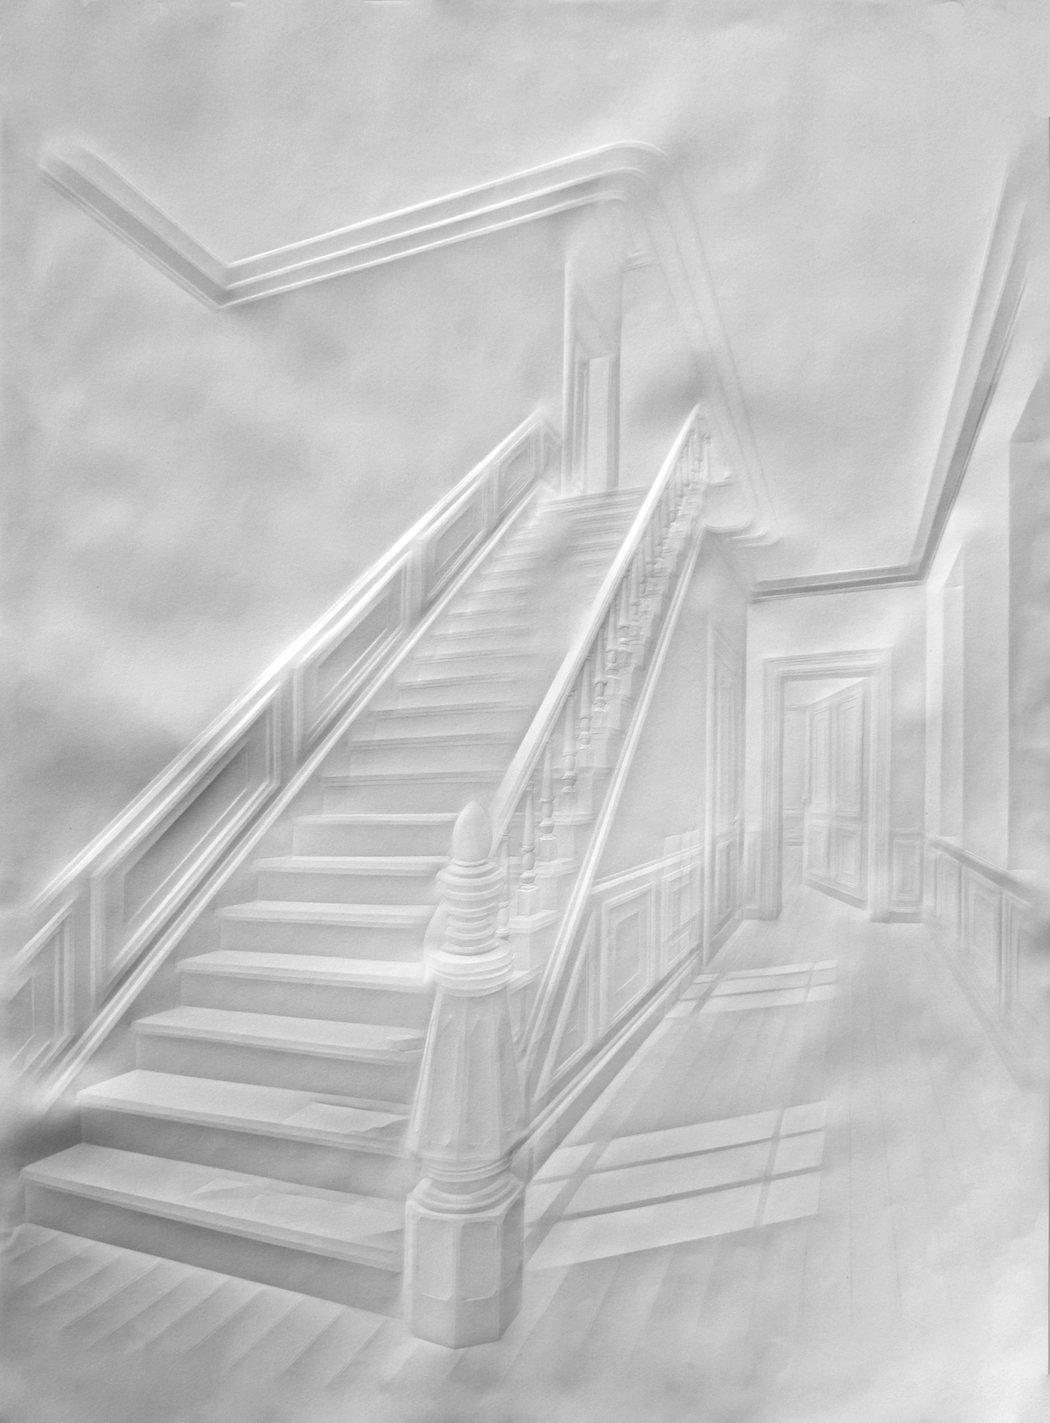 simonschubert(stairs with figure), 2015, 100cm x 70cm